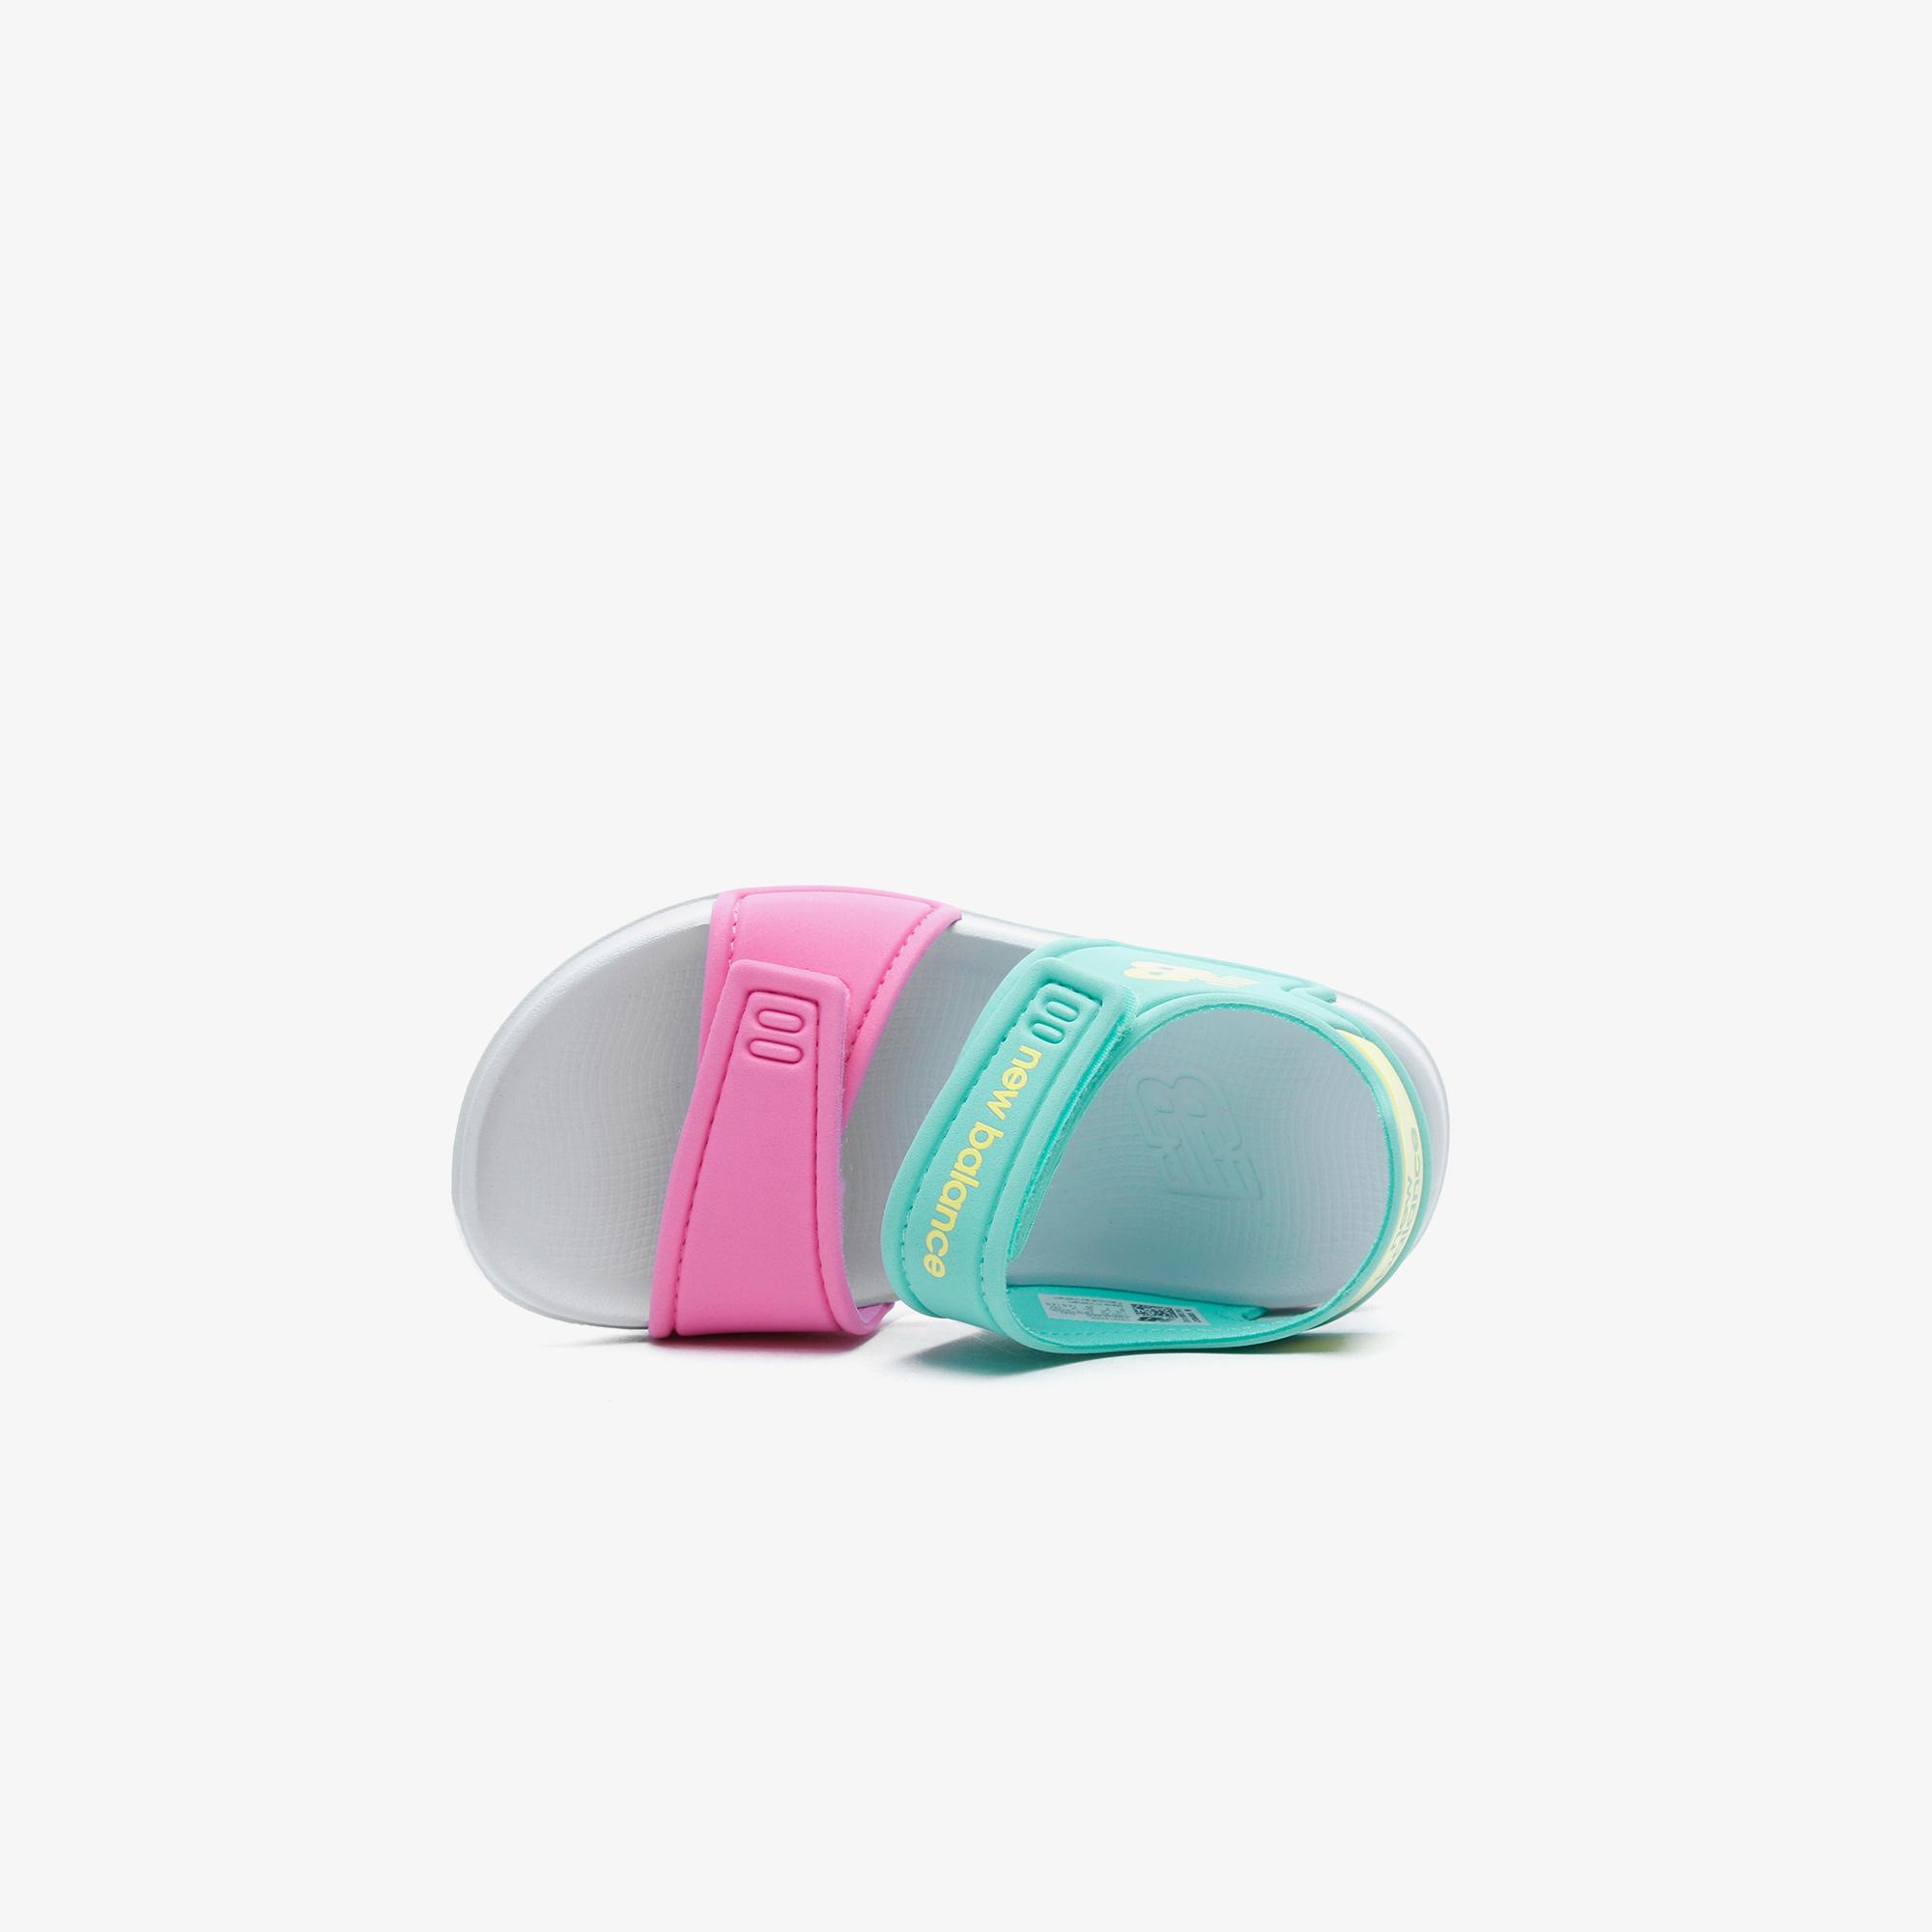 New Balance Bebek Renkli Sandalet